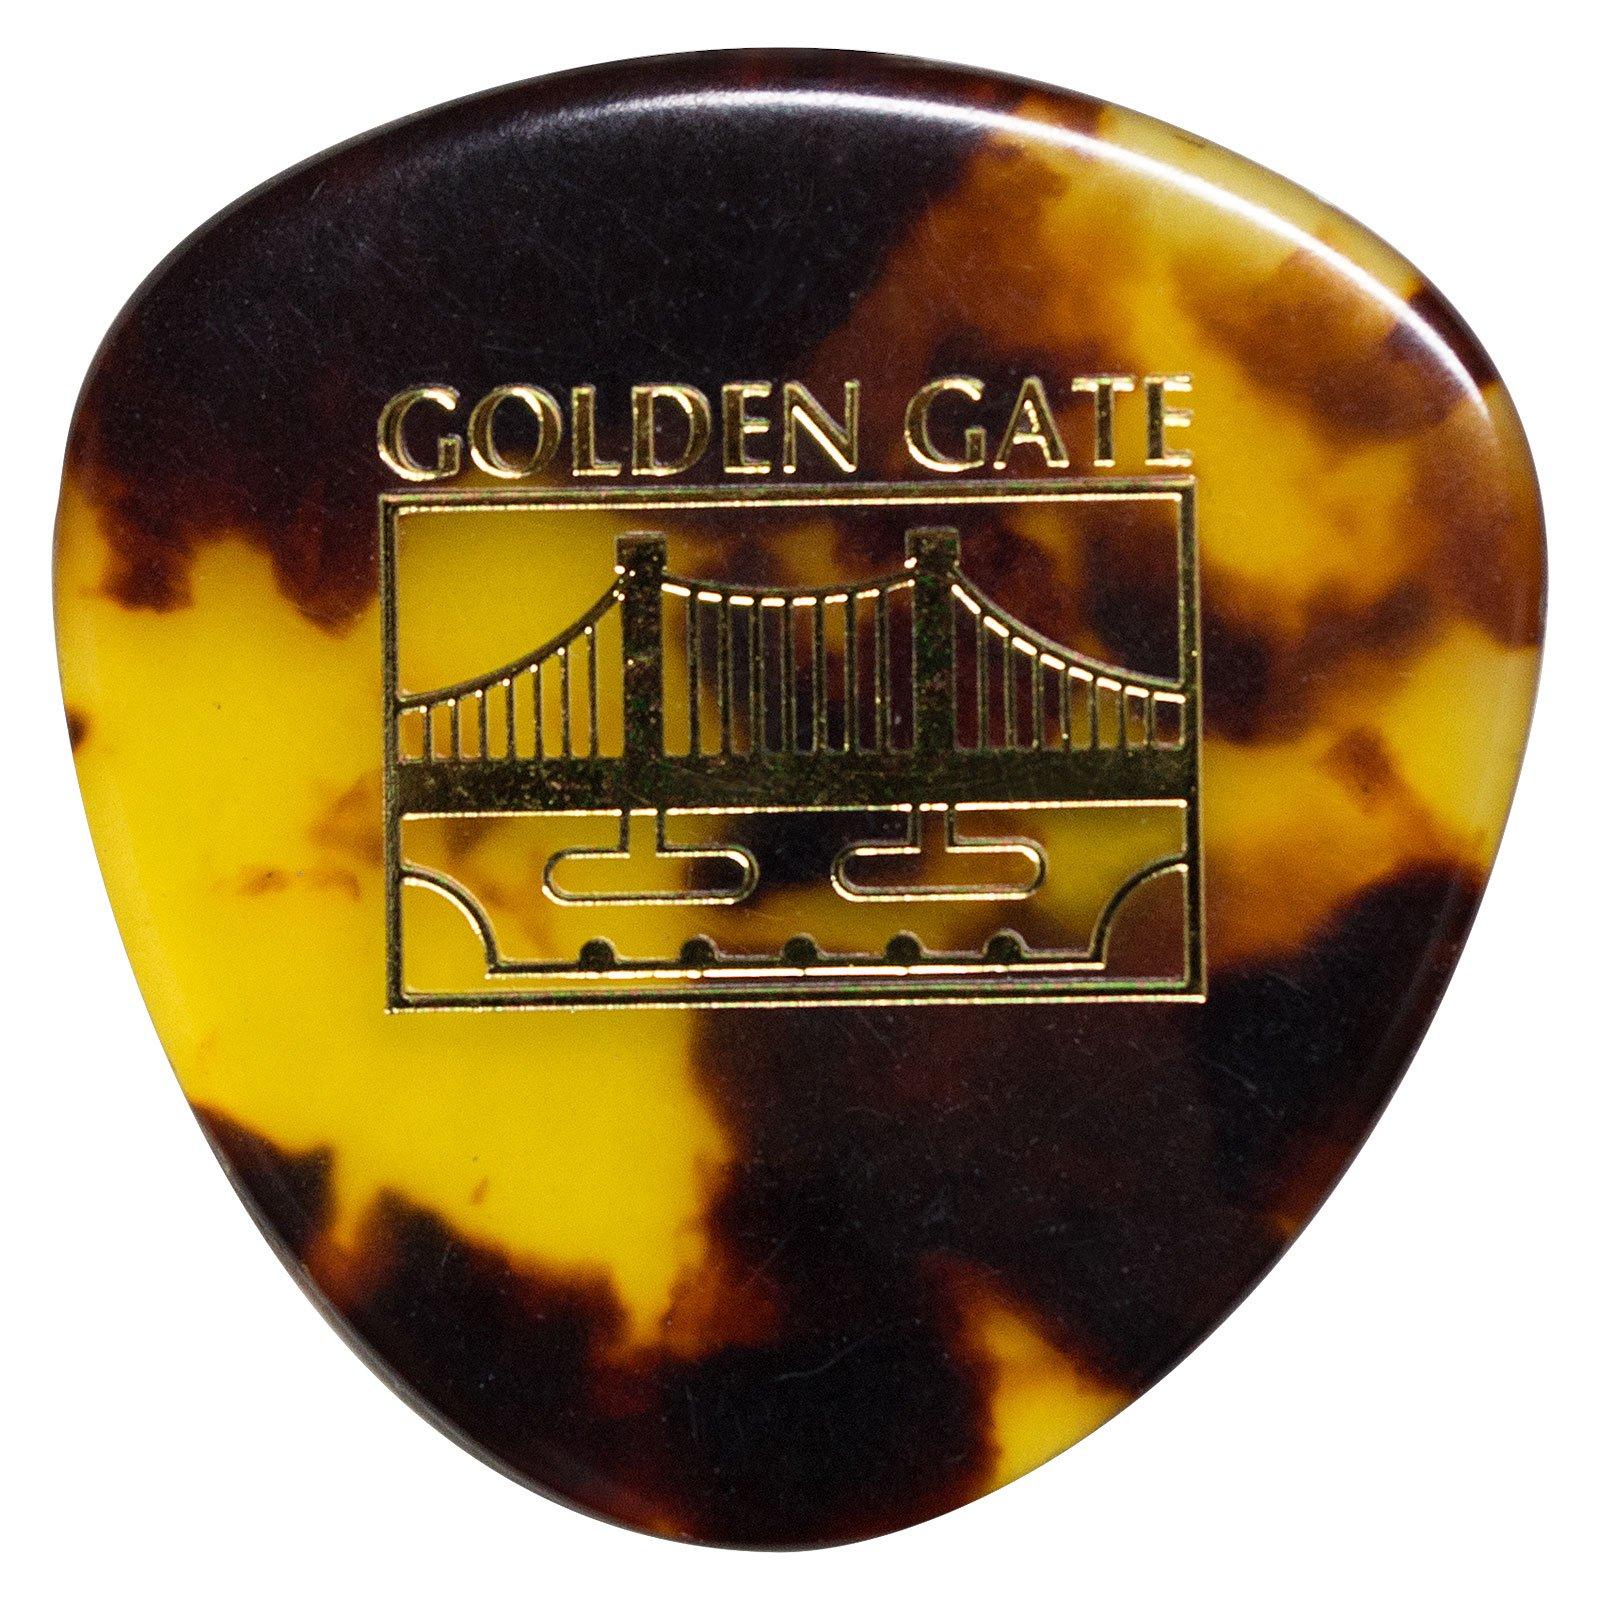 Golden Gate MP-12 Deluxe Tortoise Style Mandolin Pick - Rounded Triangle - Dozen